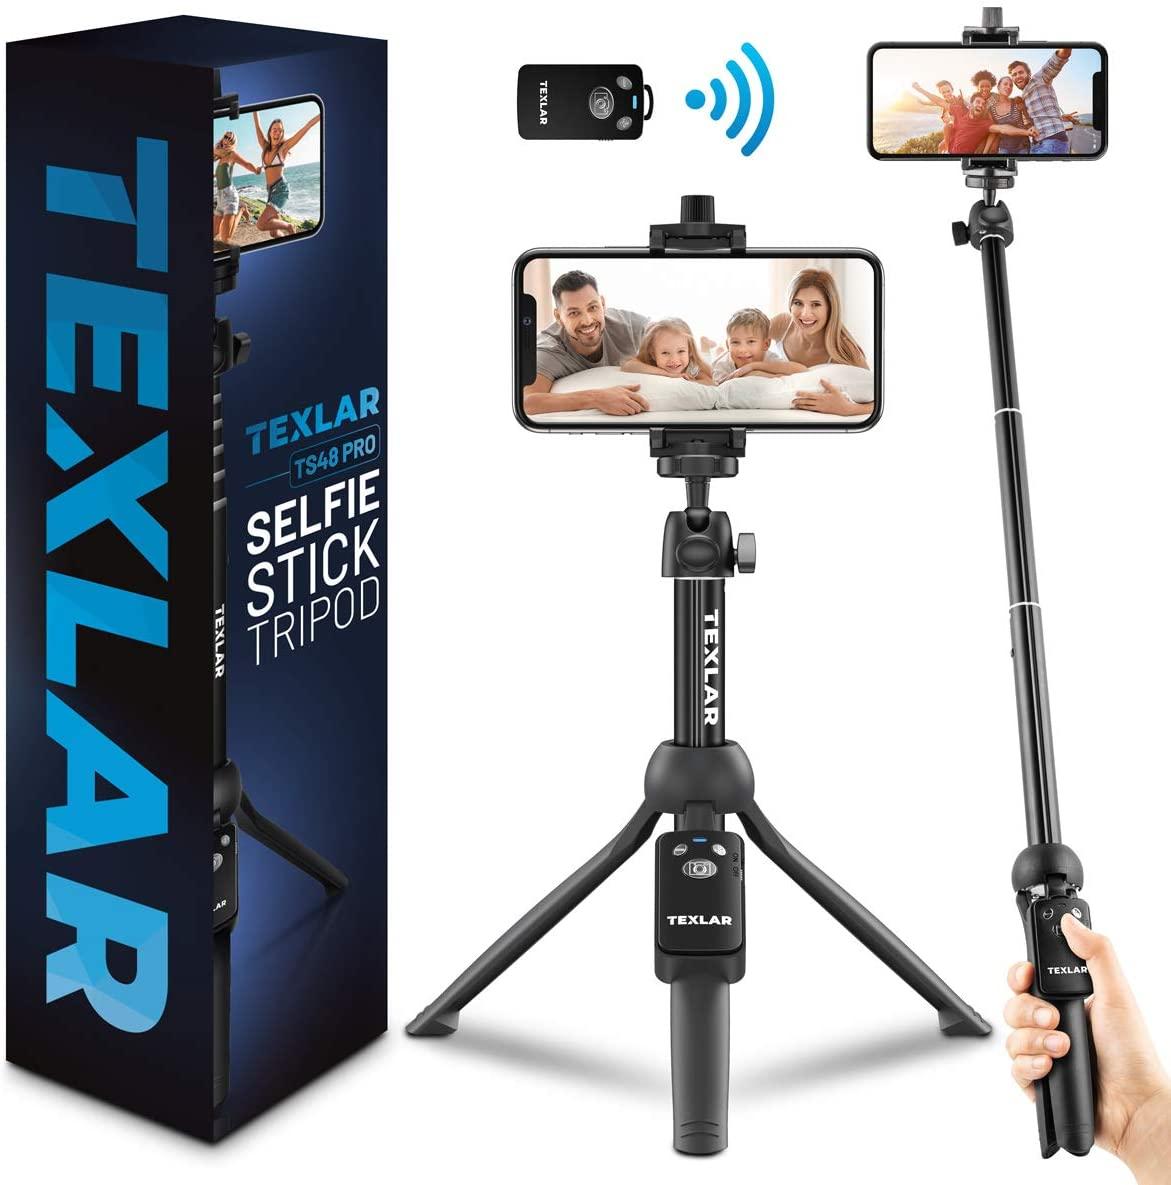 Texlar Selfie Stick